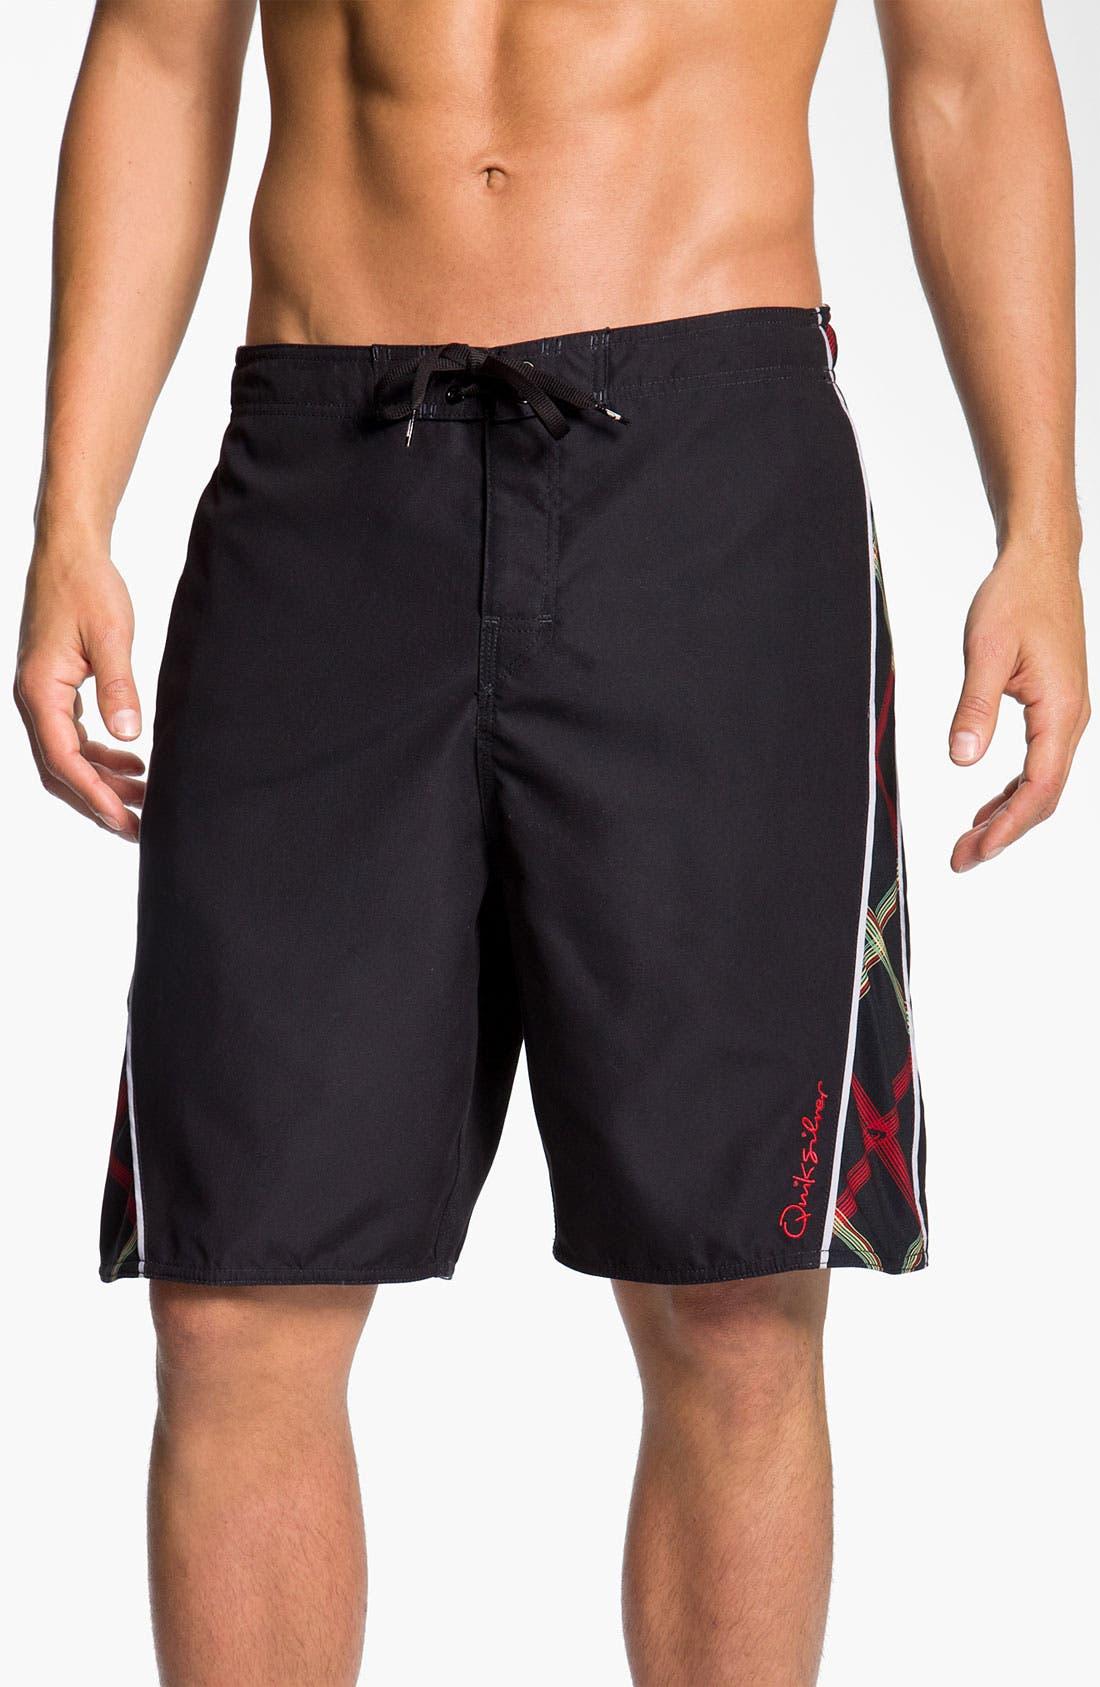 Alternate Image 1 Selected - Quiksilver Waterman  'Coopers Beach' Board Shorts